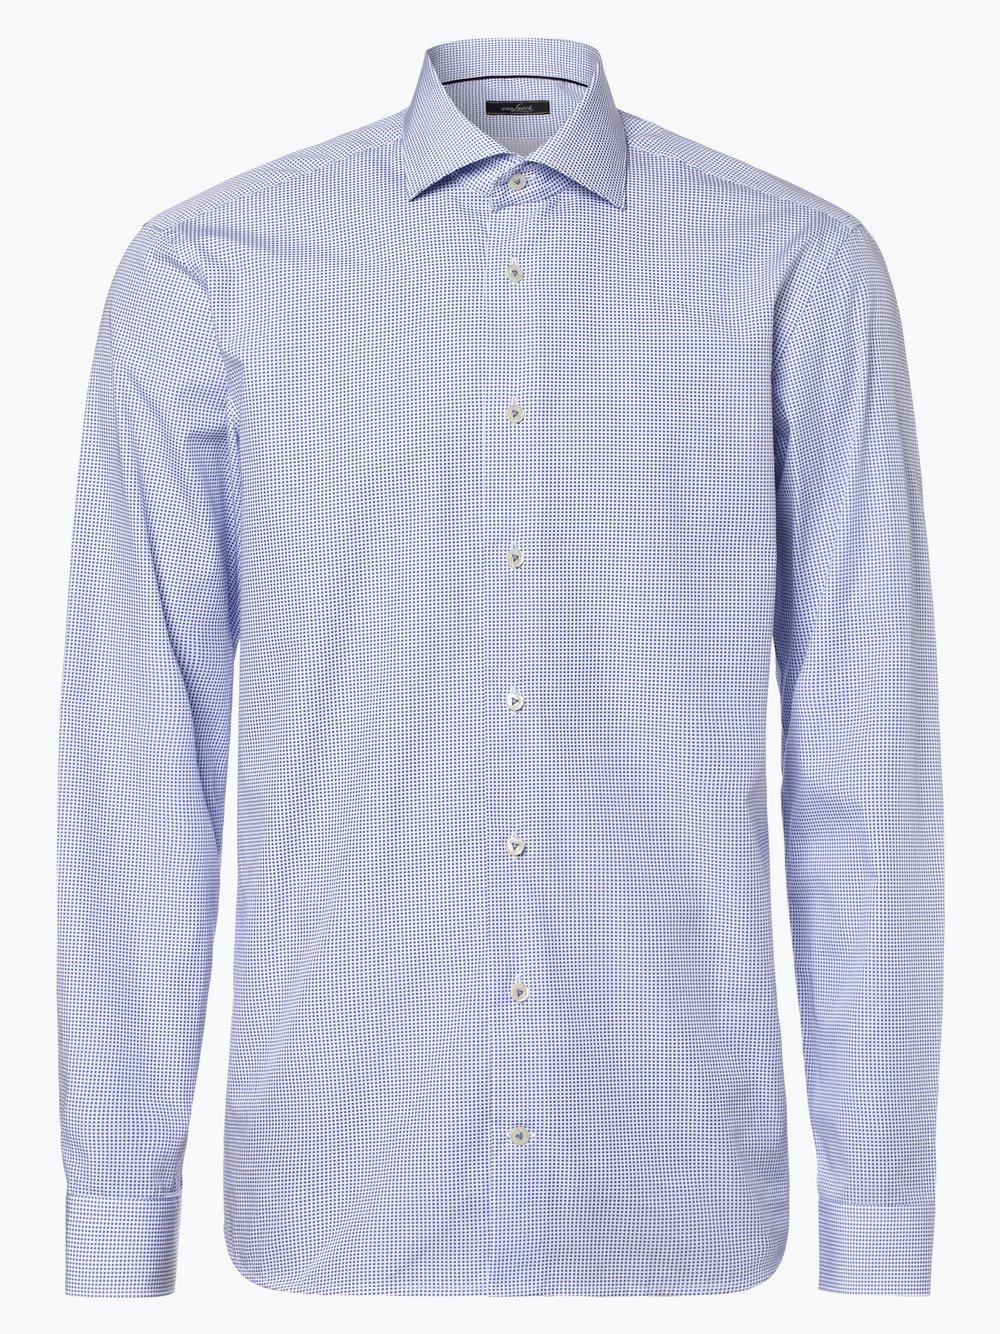 Van Laack – Koszula męska, biały Van Graaf 444142-0001-00400